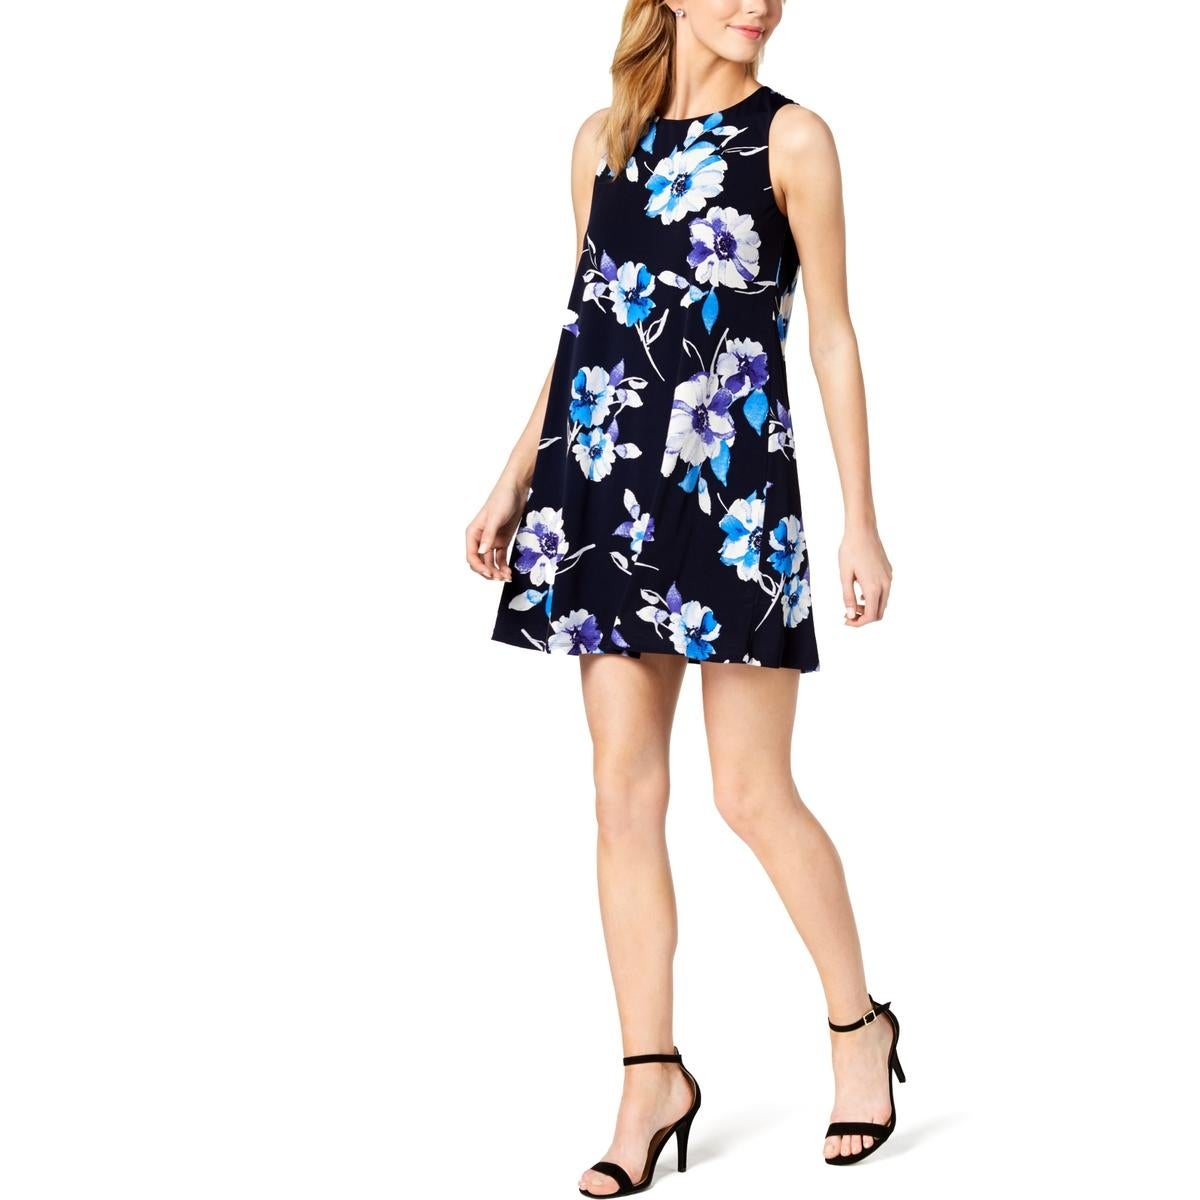 26e5d557 Shop Jessica Howard Womens Petites Shift Dress Sleeveless Floral ...